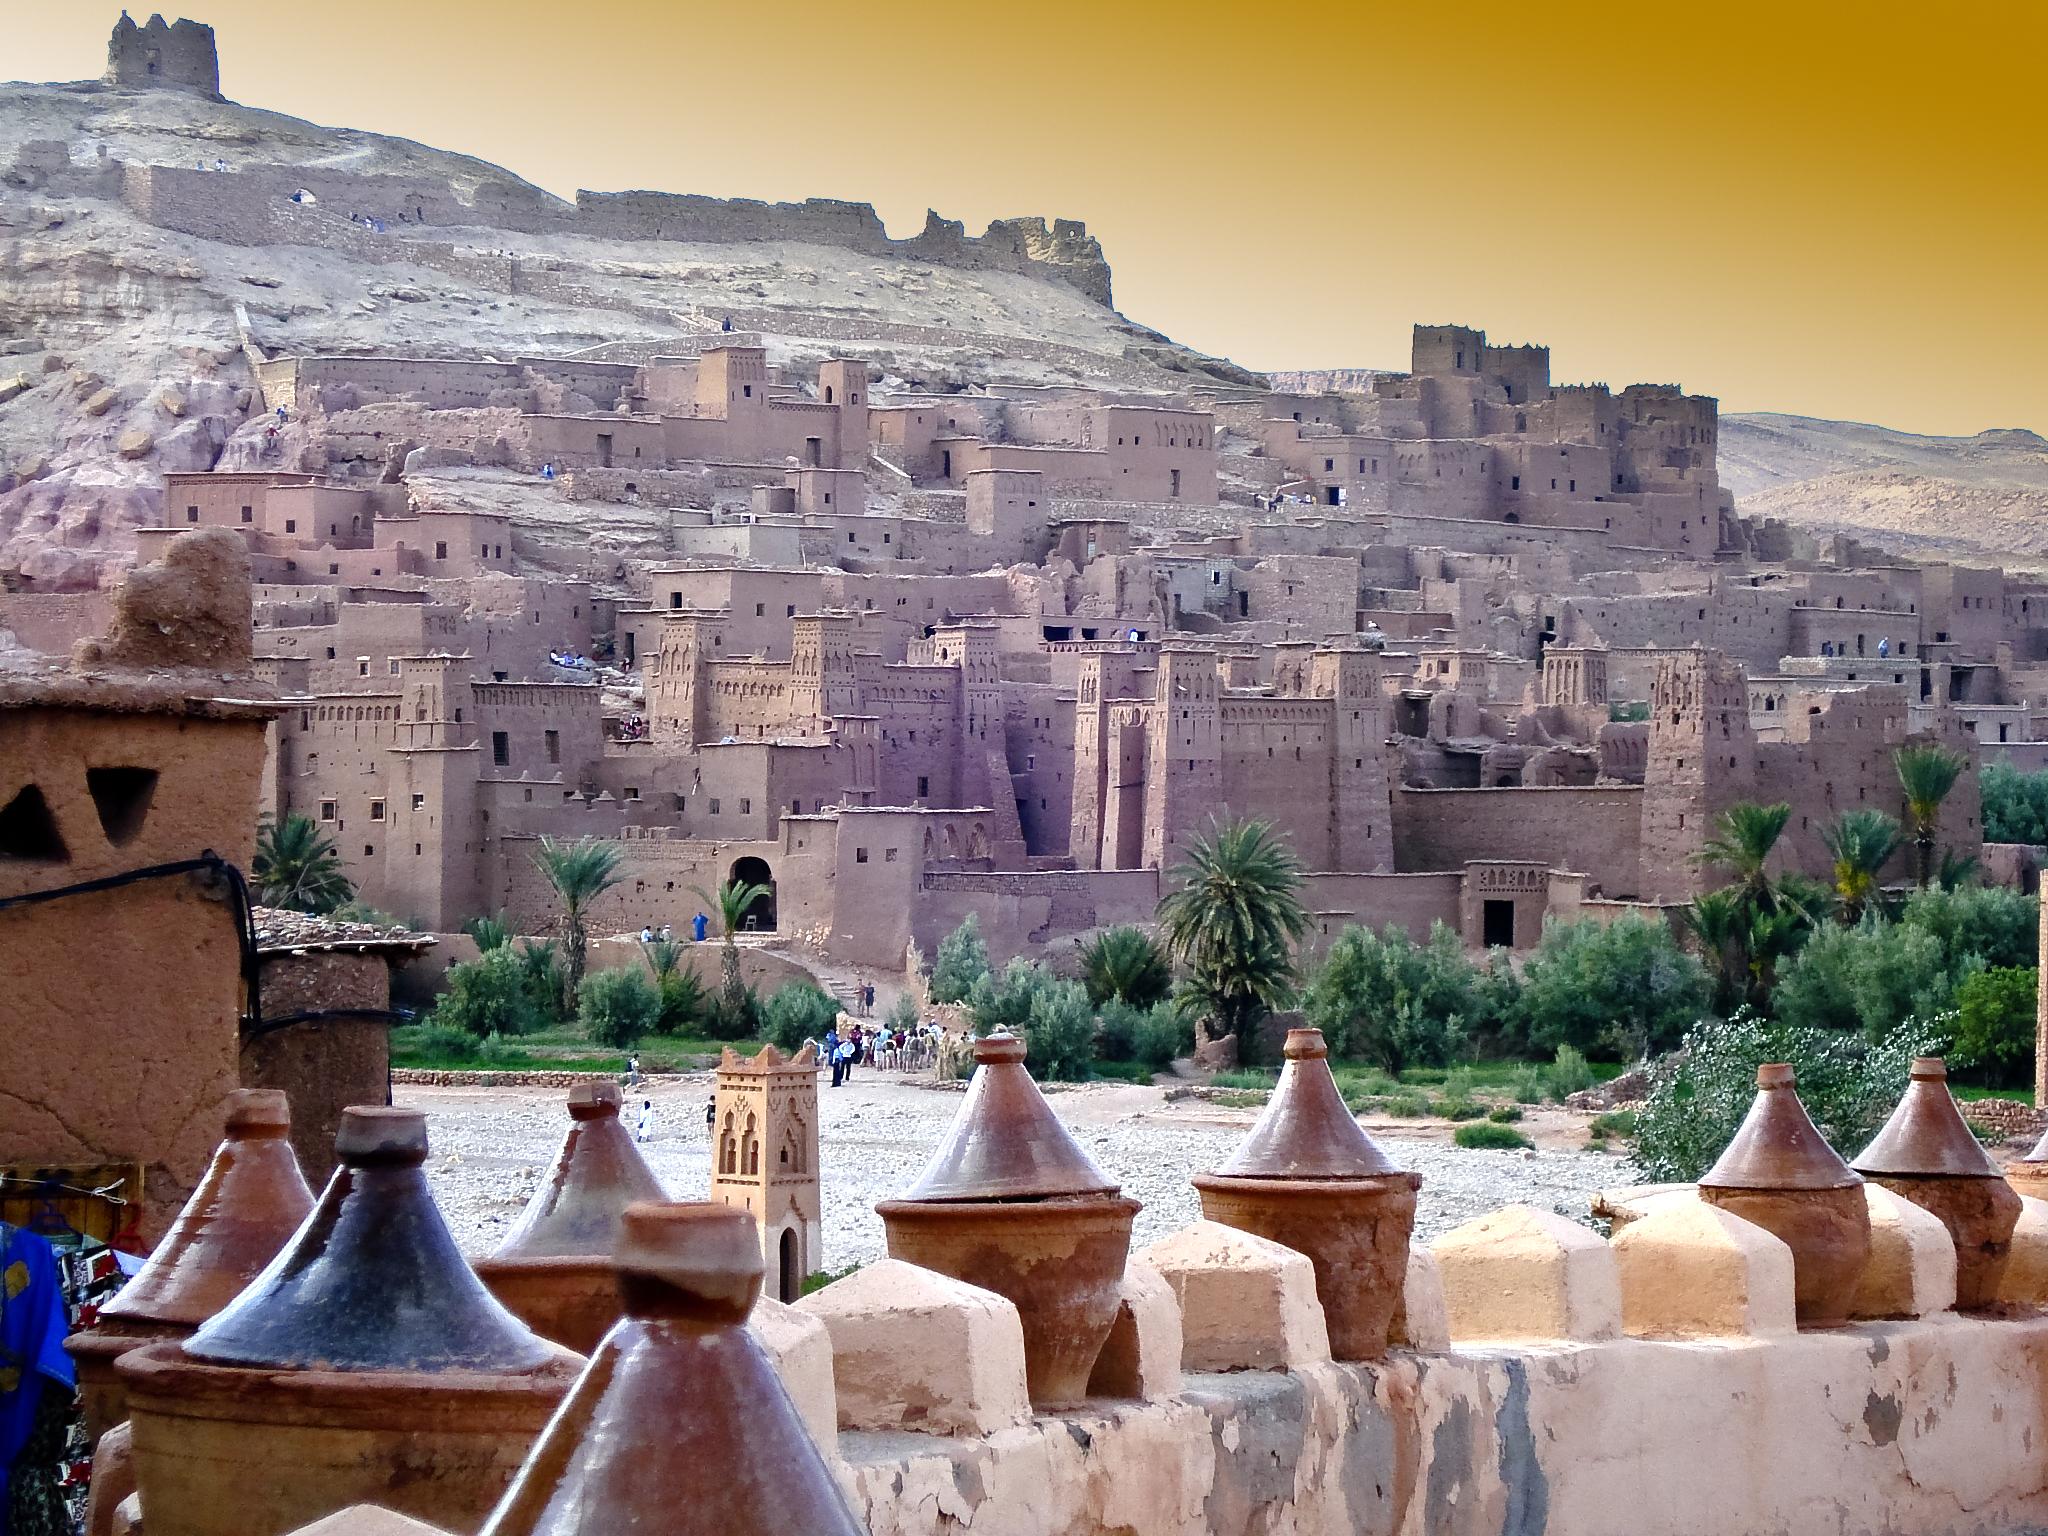 Gebirge In Marokko 3 Buchstaben